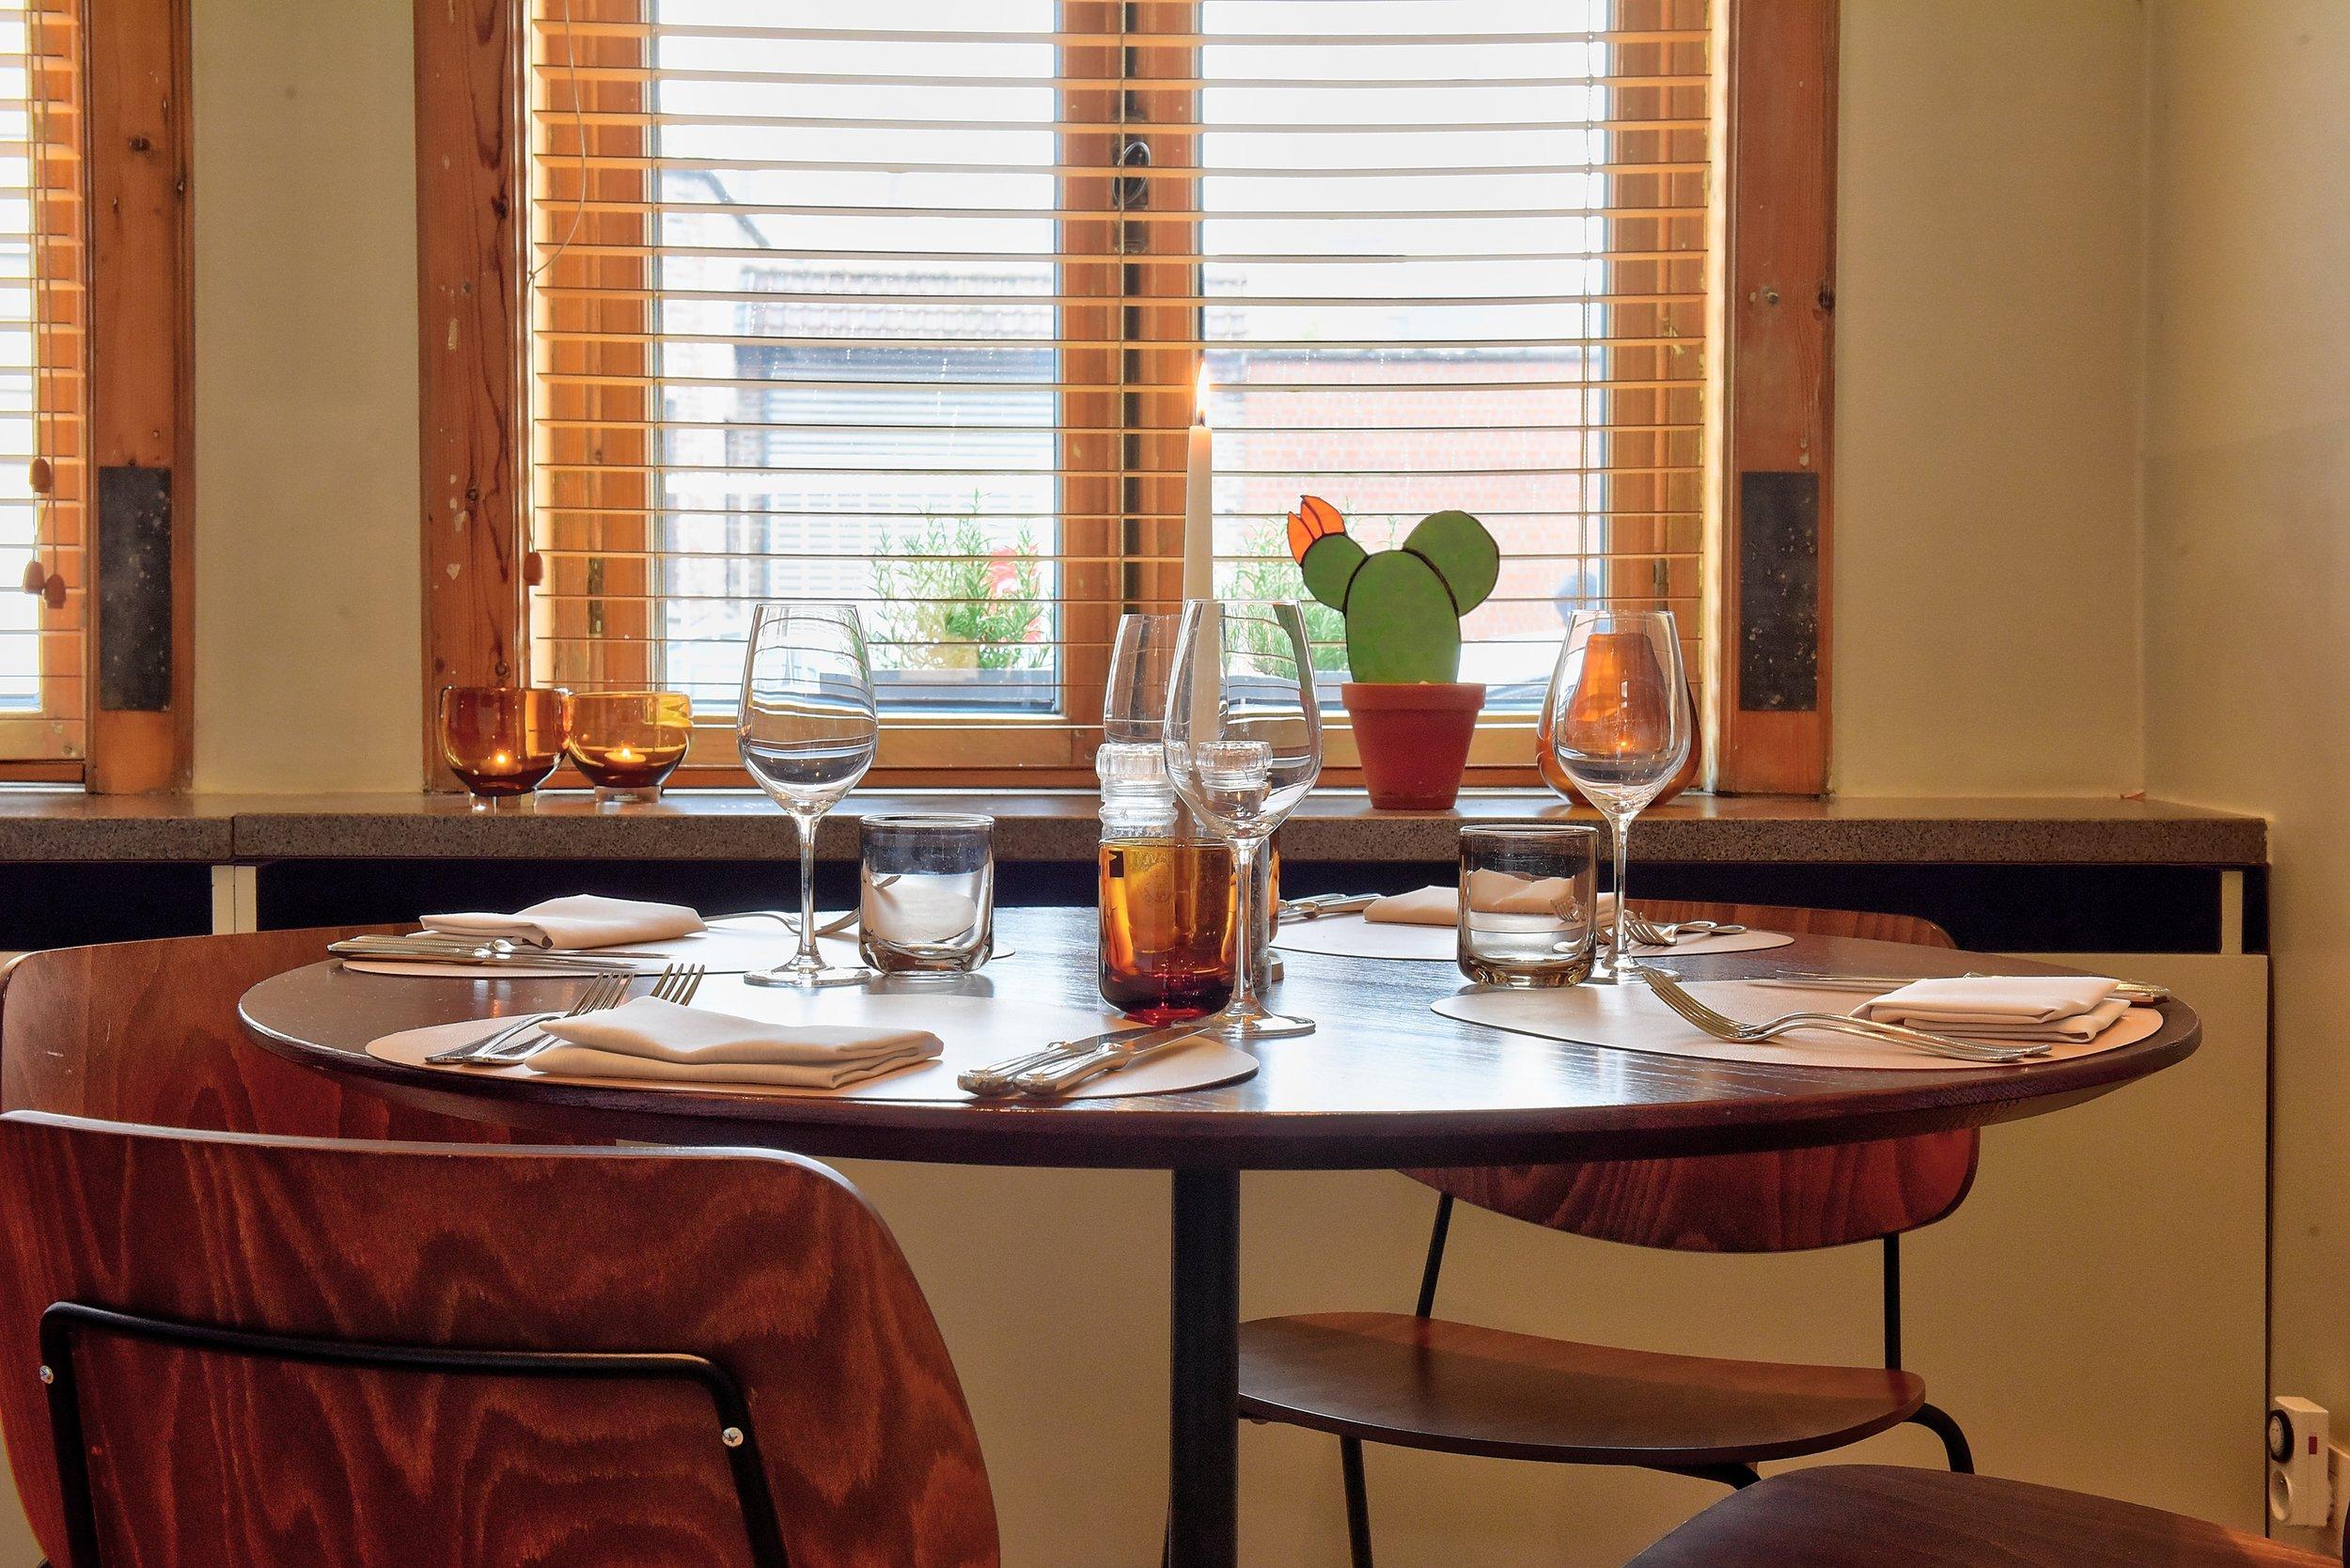 de huiskamer roeselare restaurant tablefever bart albrecht.jpg.jpg